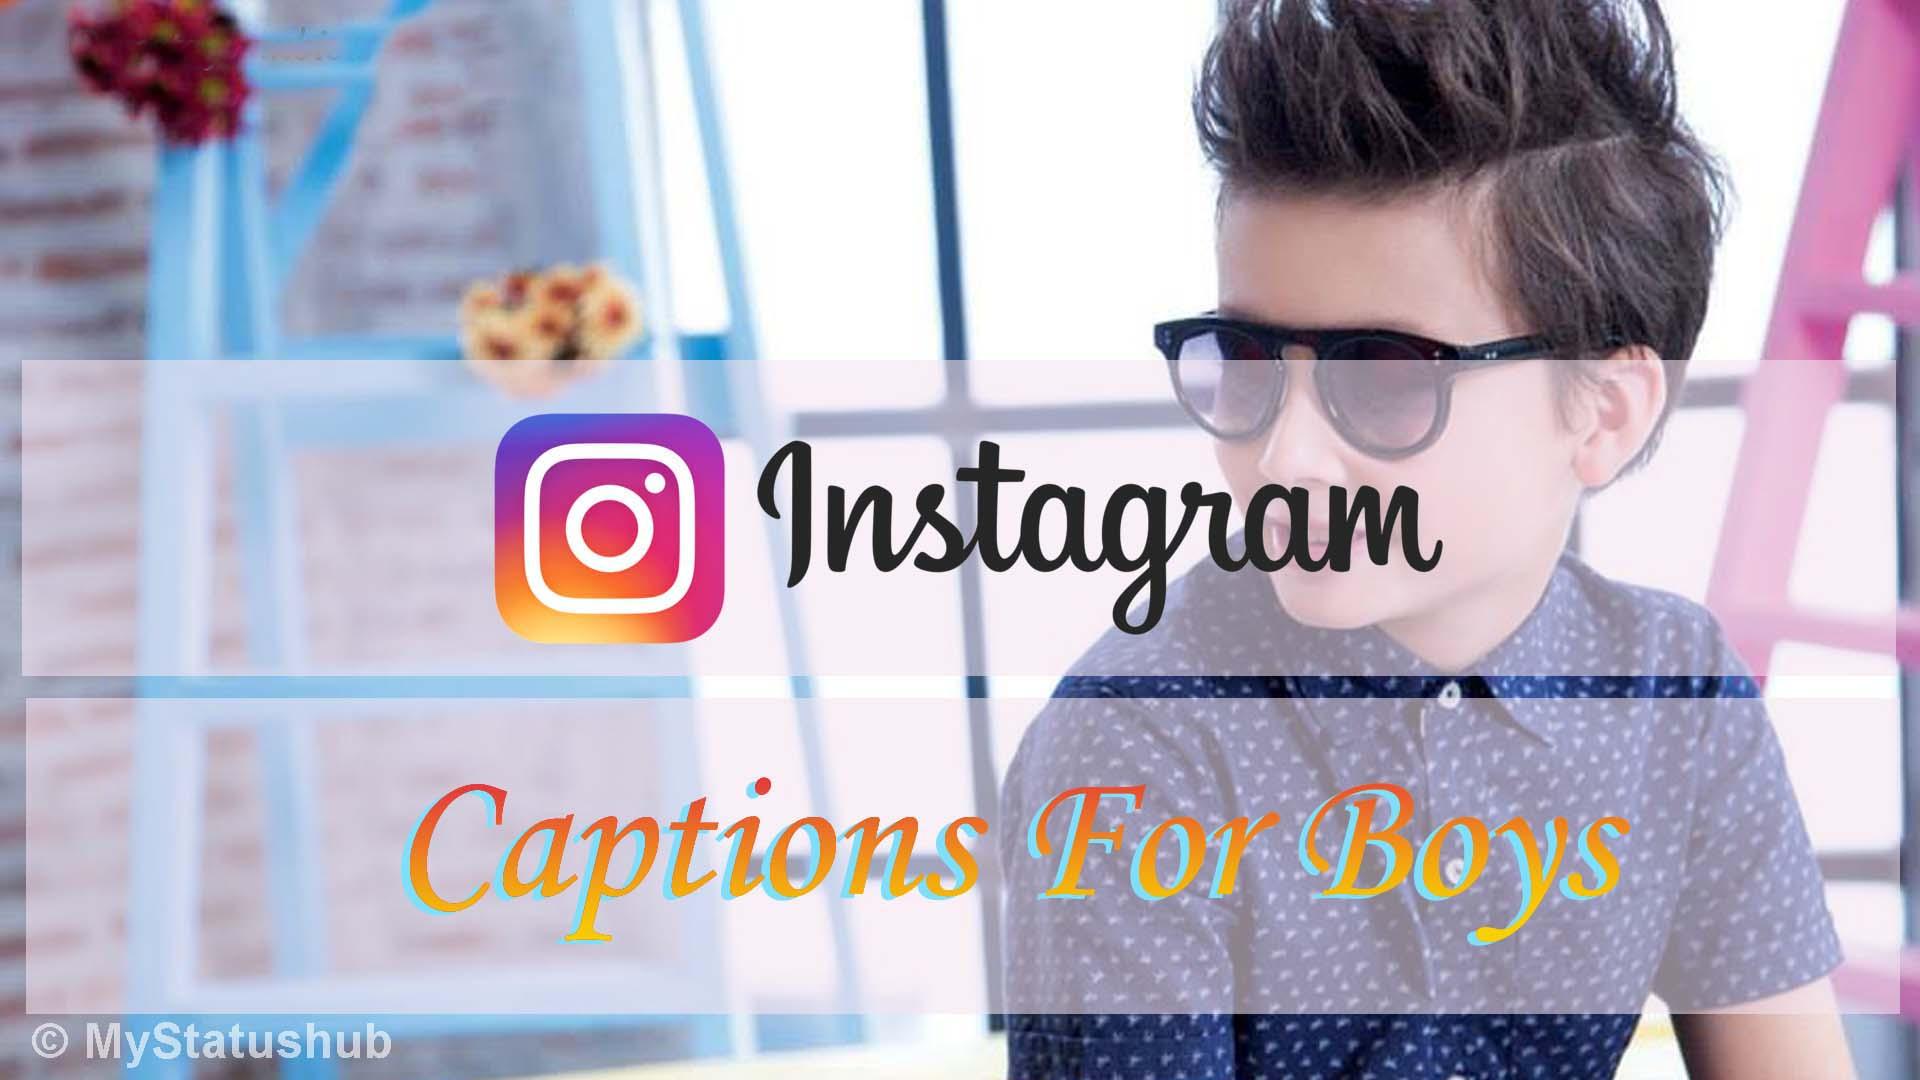 instagram captions for boys